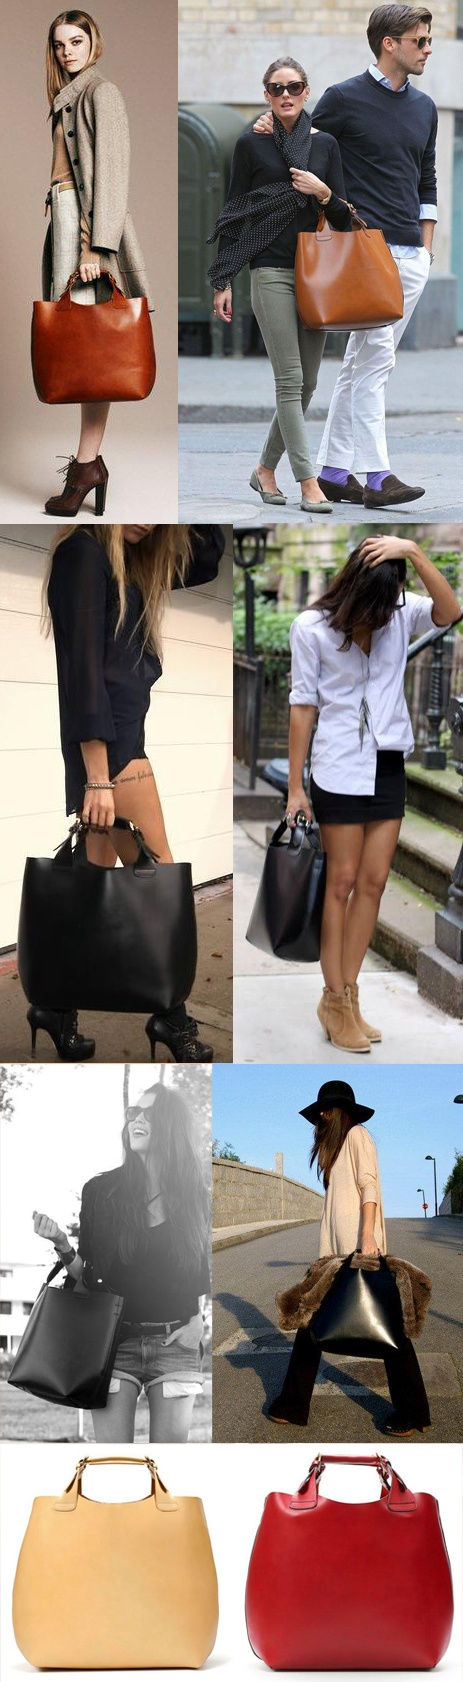 plaited shopper bag by zara: black or brown?!